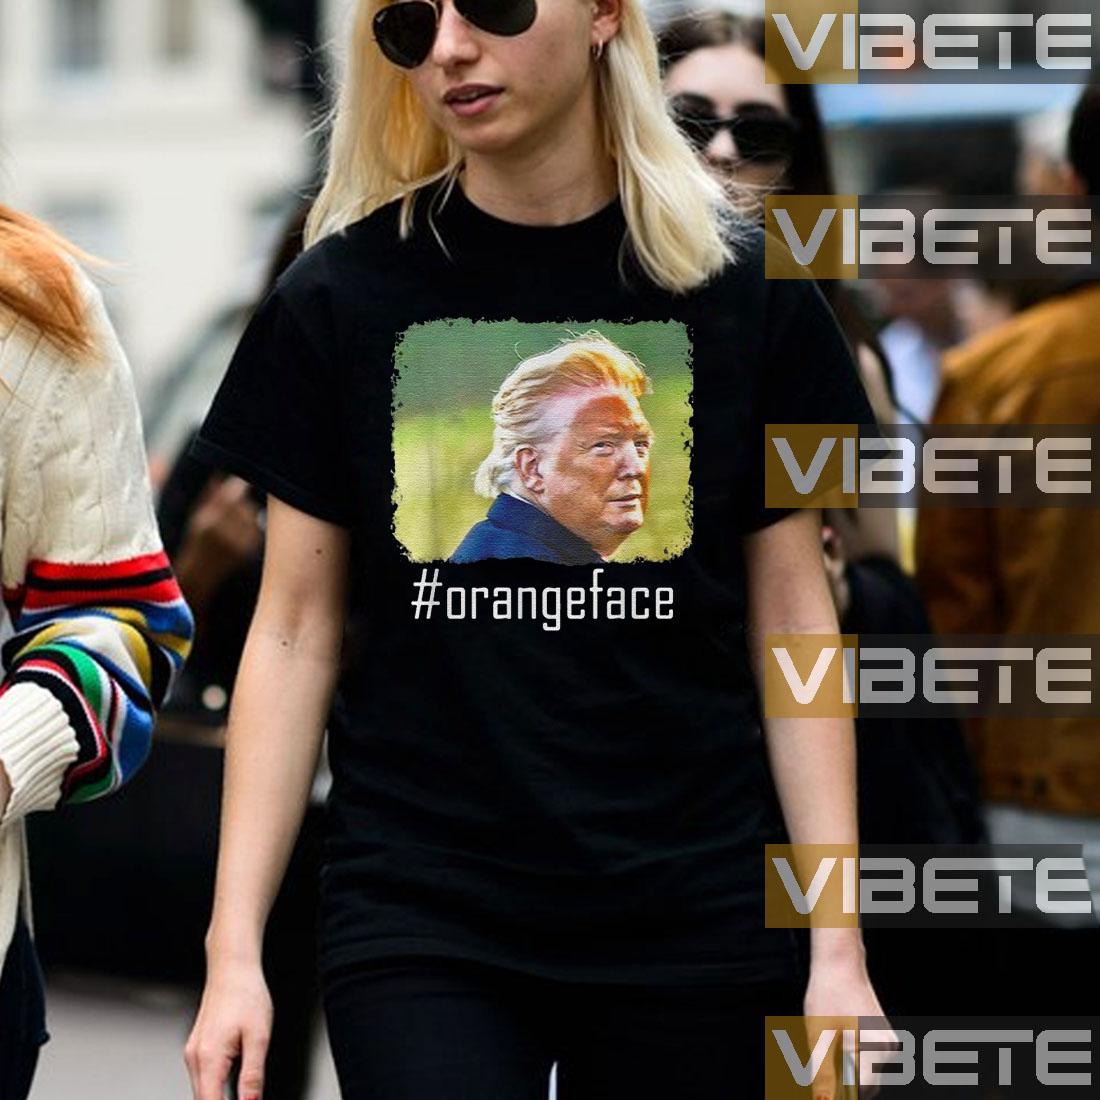 Donald Trump #orangeface tshirts